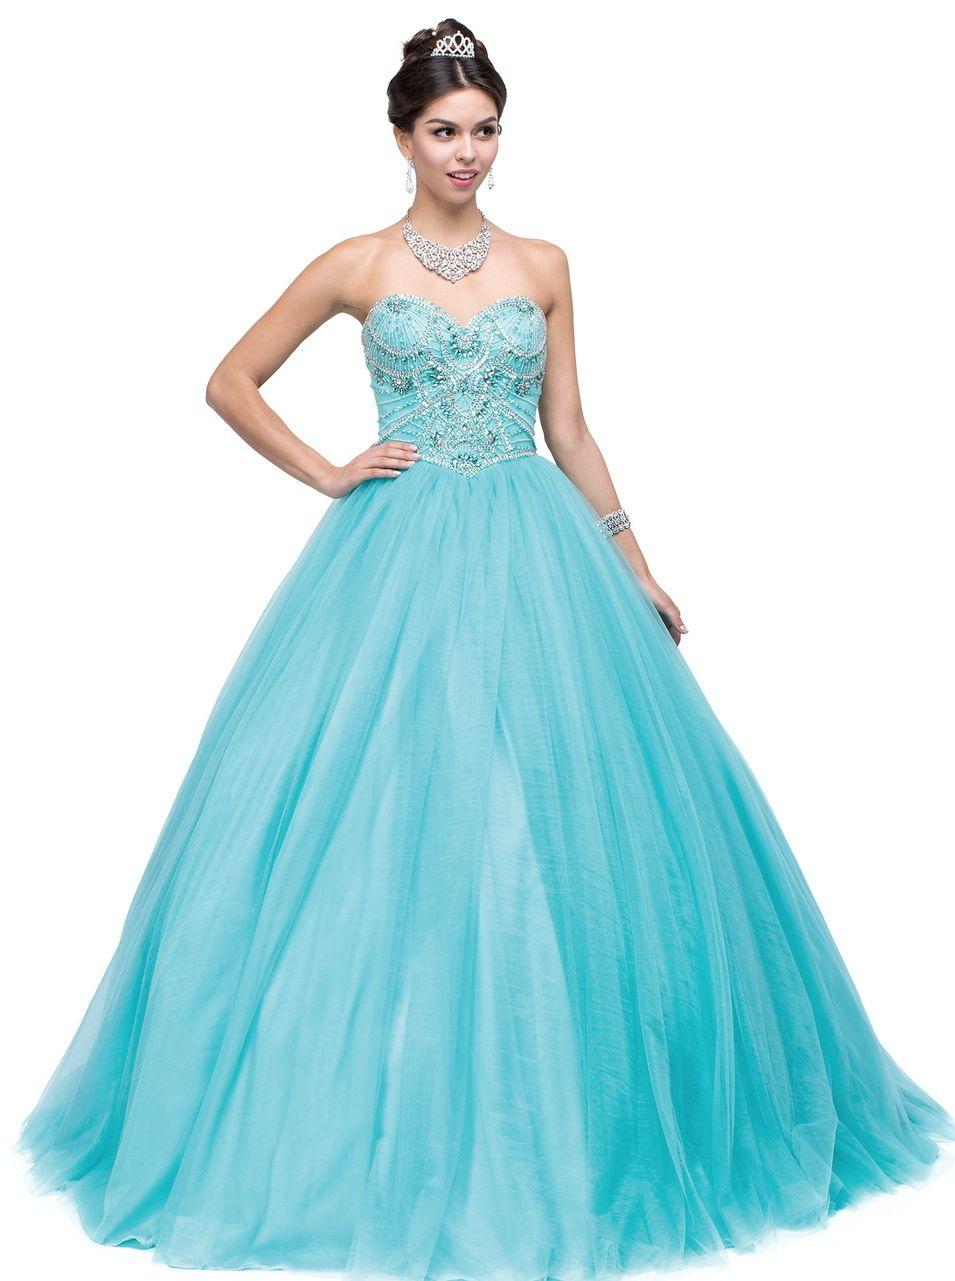 Quinceanera Dresses Prom Dresses<BR>aqn1145<BR>Sweetheart neckline ...